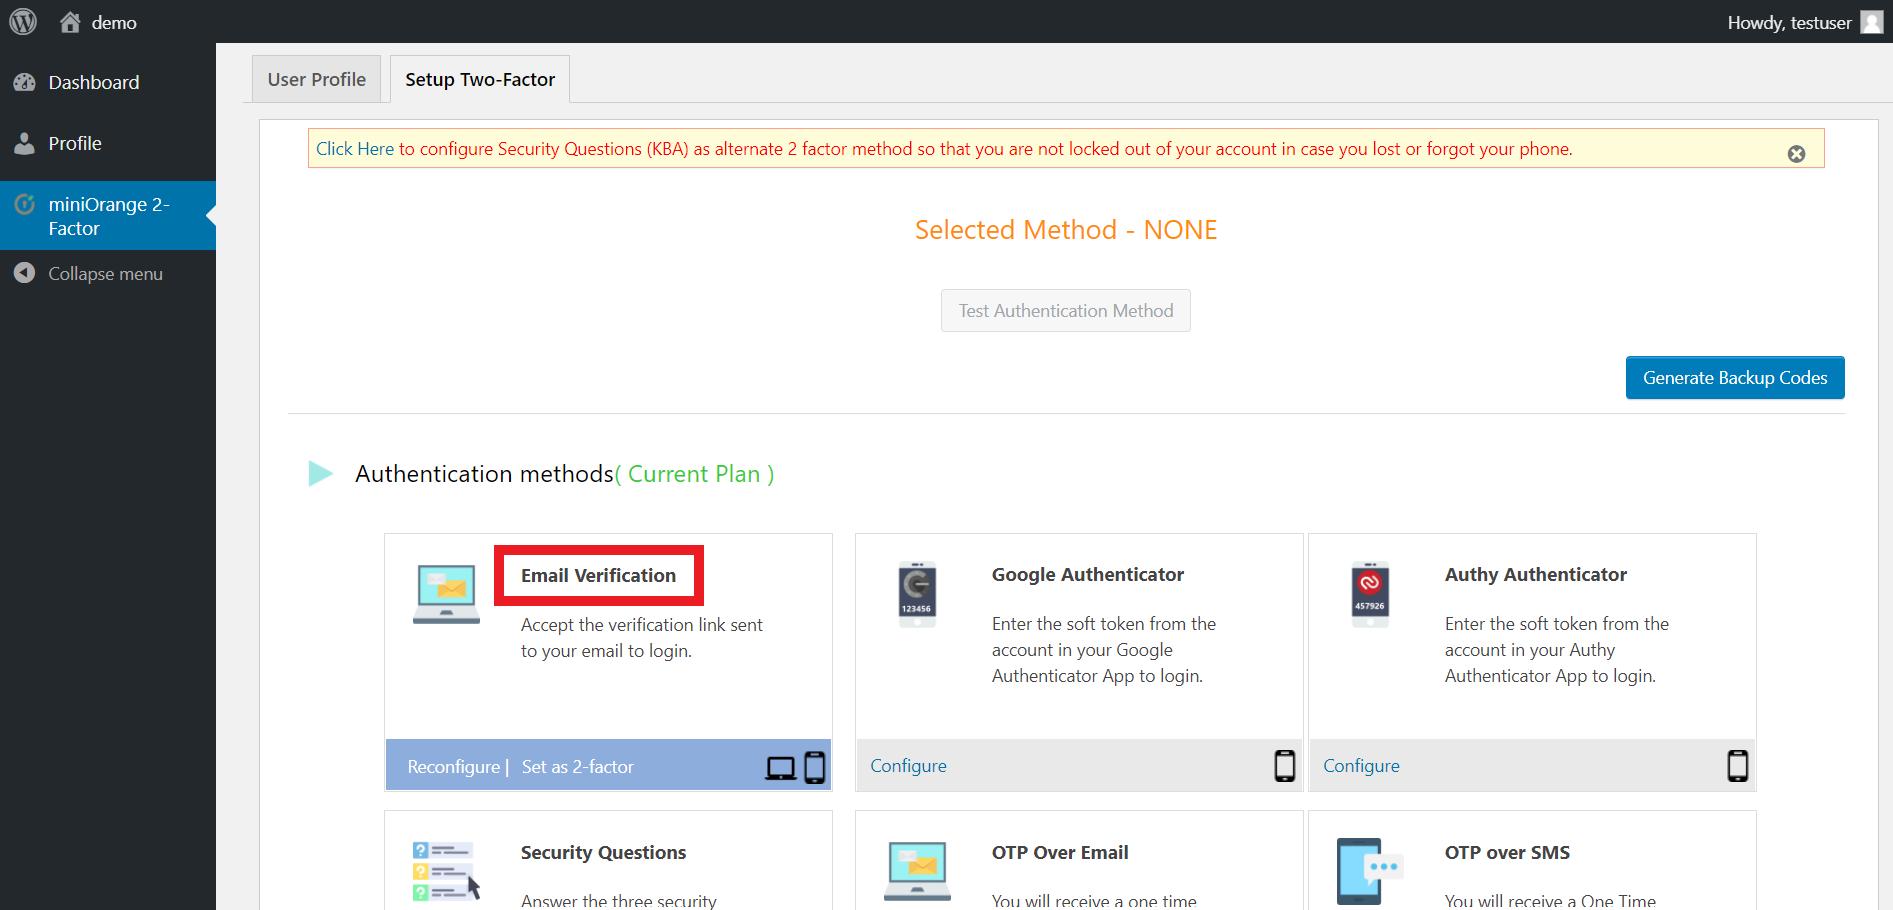 Email-verification-configure-user-end